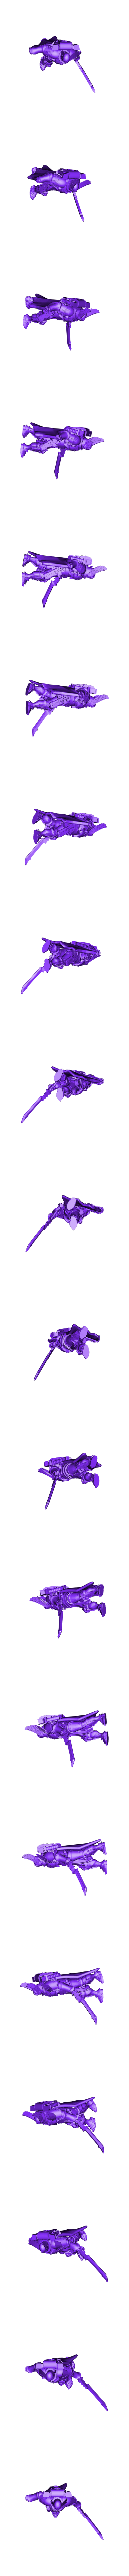 Legion_Master.stl Download free STL file Legion Master - The Phoenician • 3D print template, ThatEvilOne